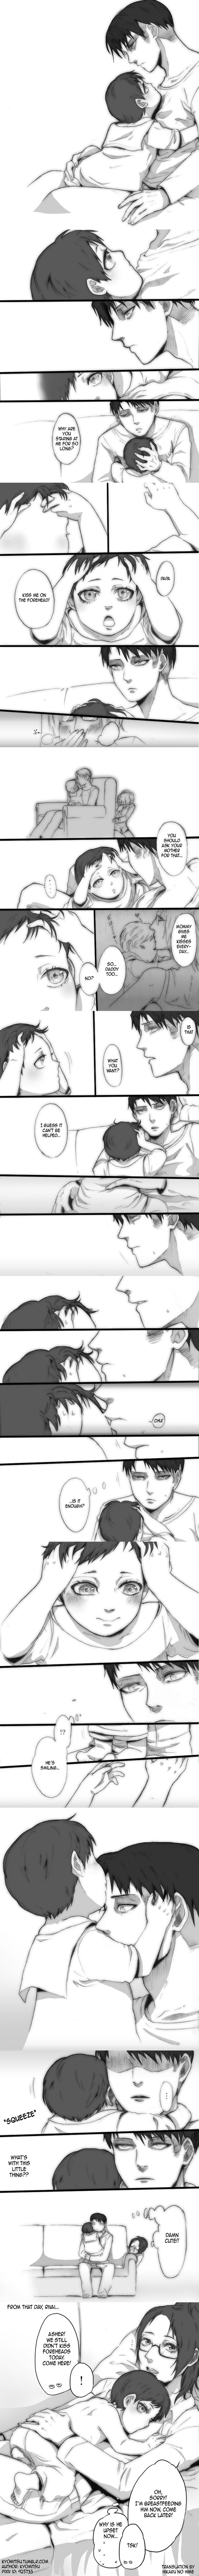 Levi ♥ Hanji